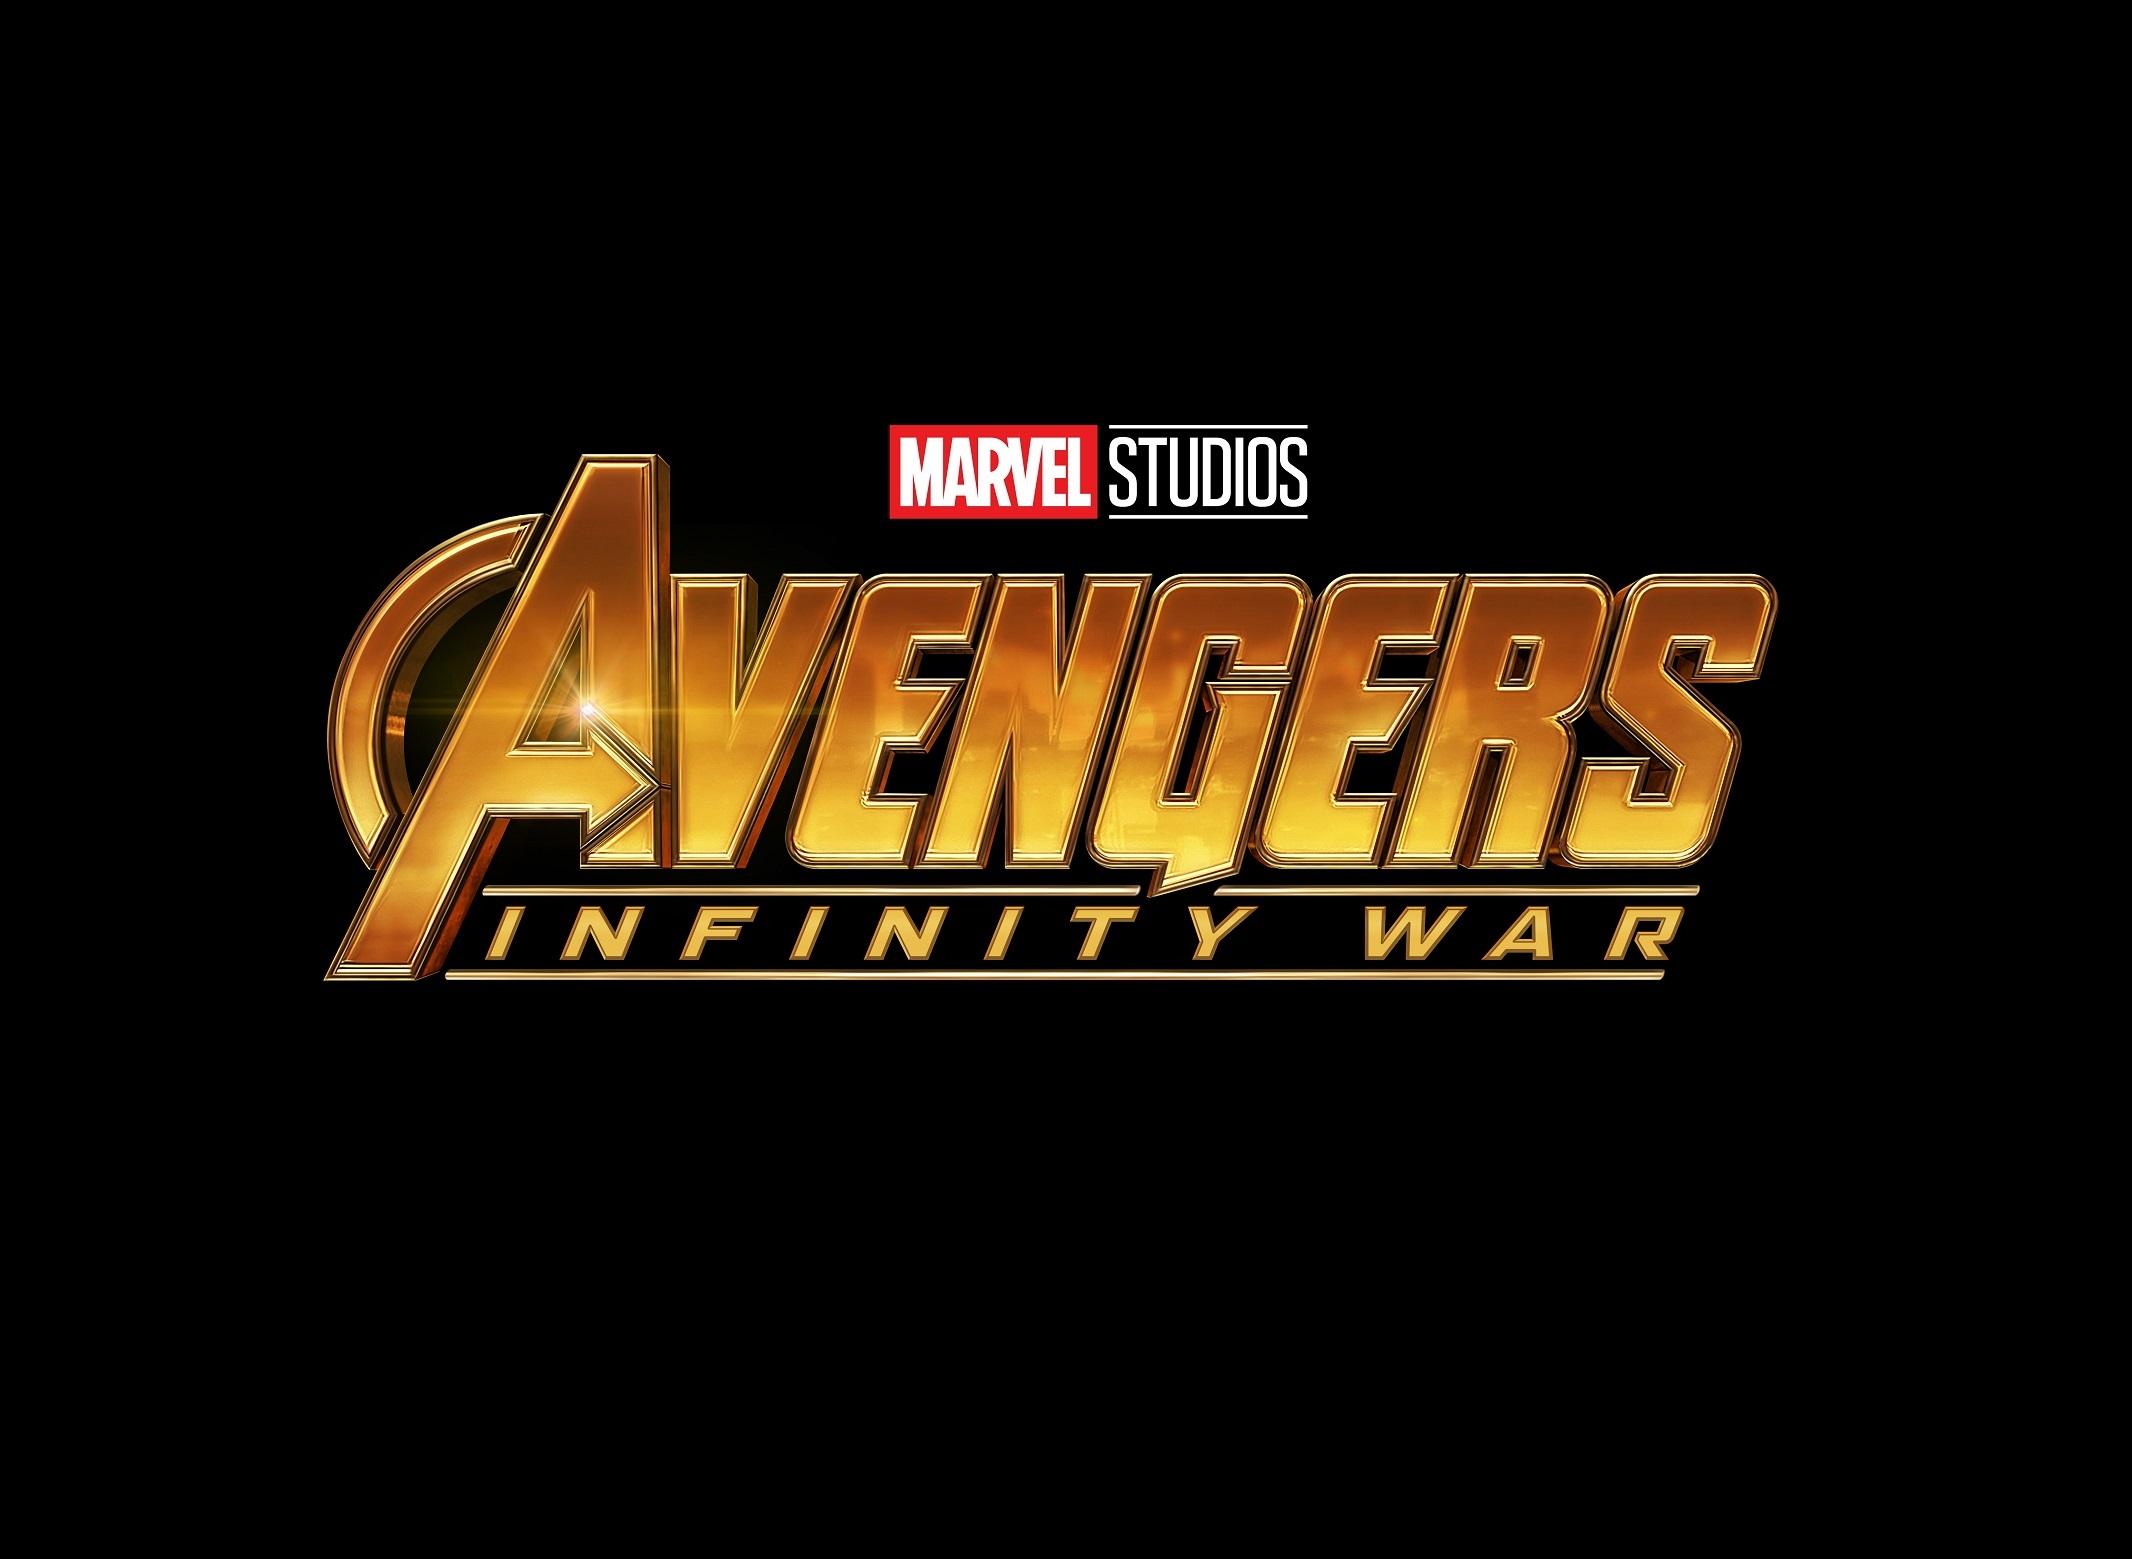 (C)2017 Marvel